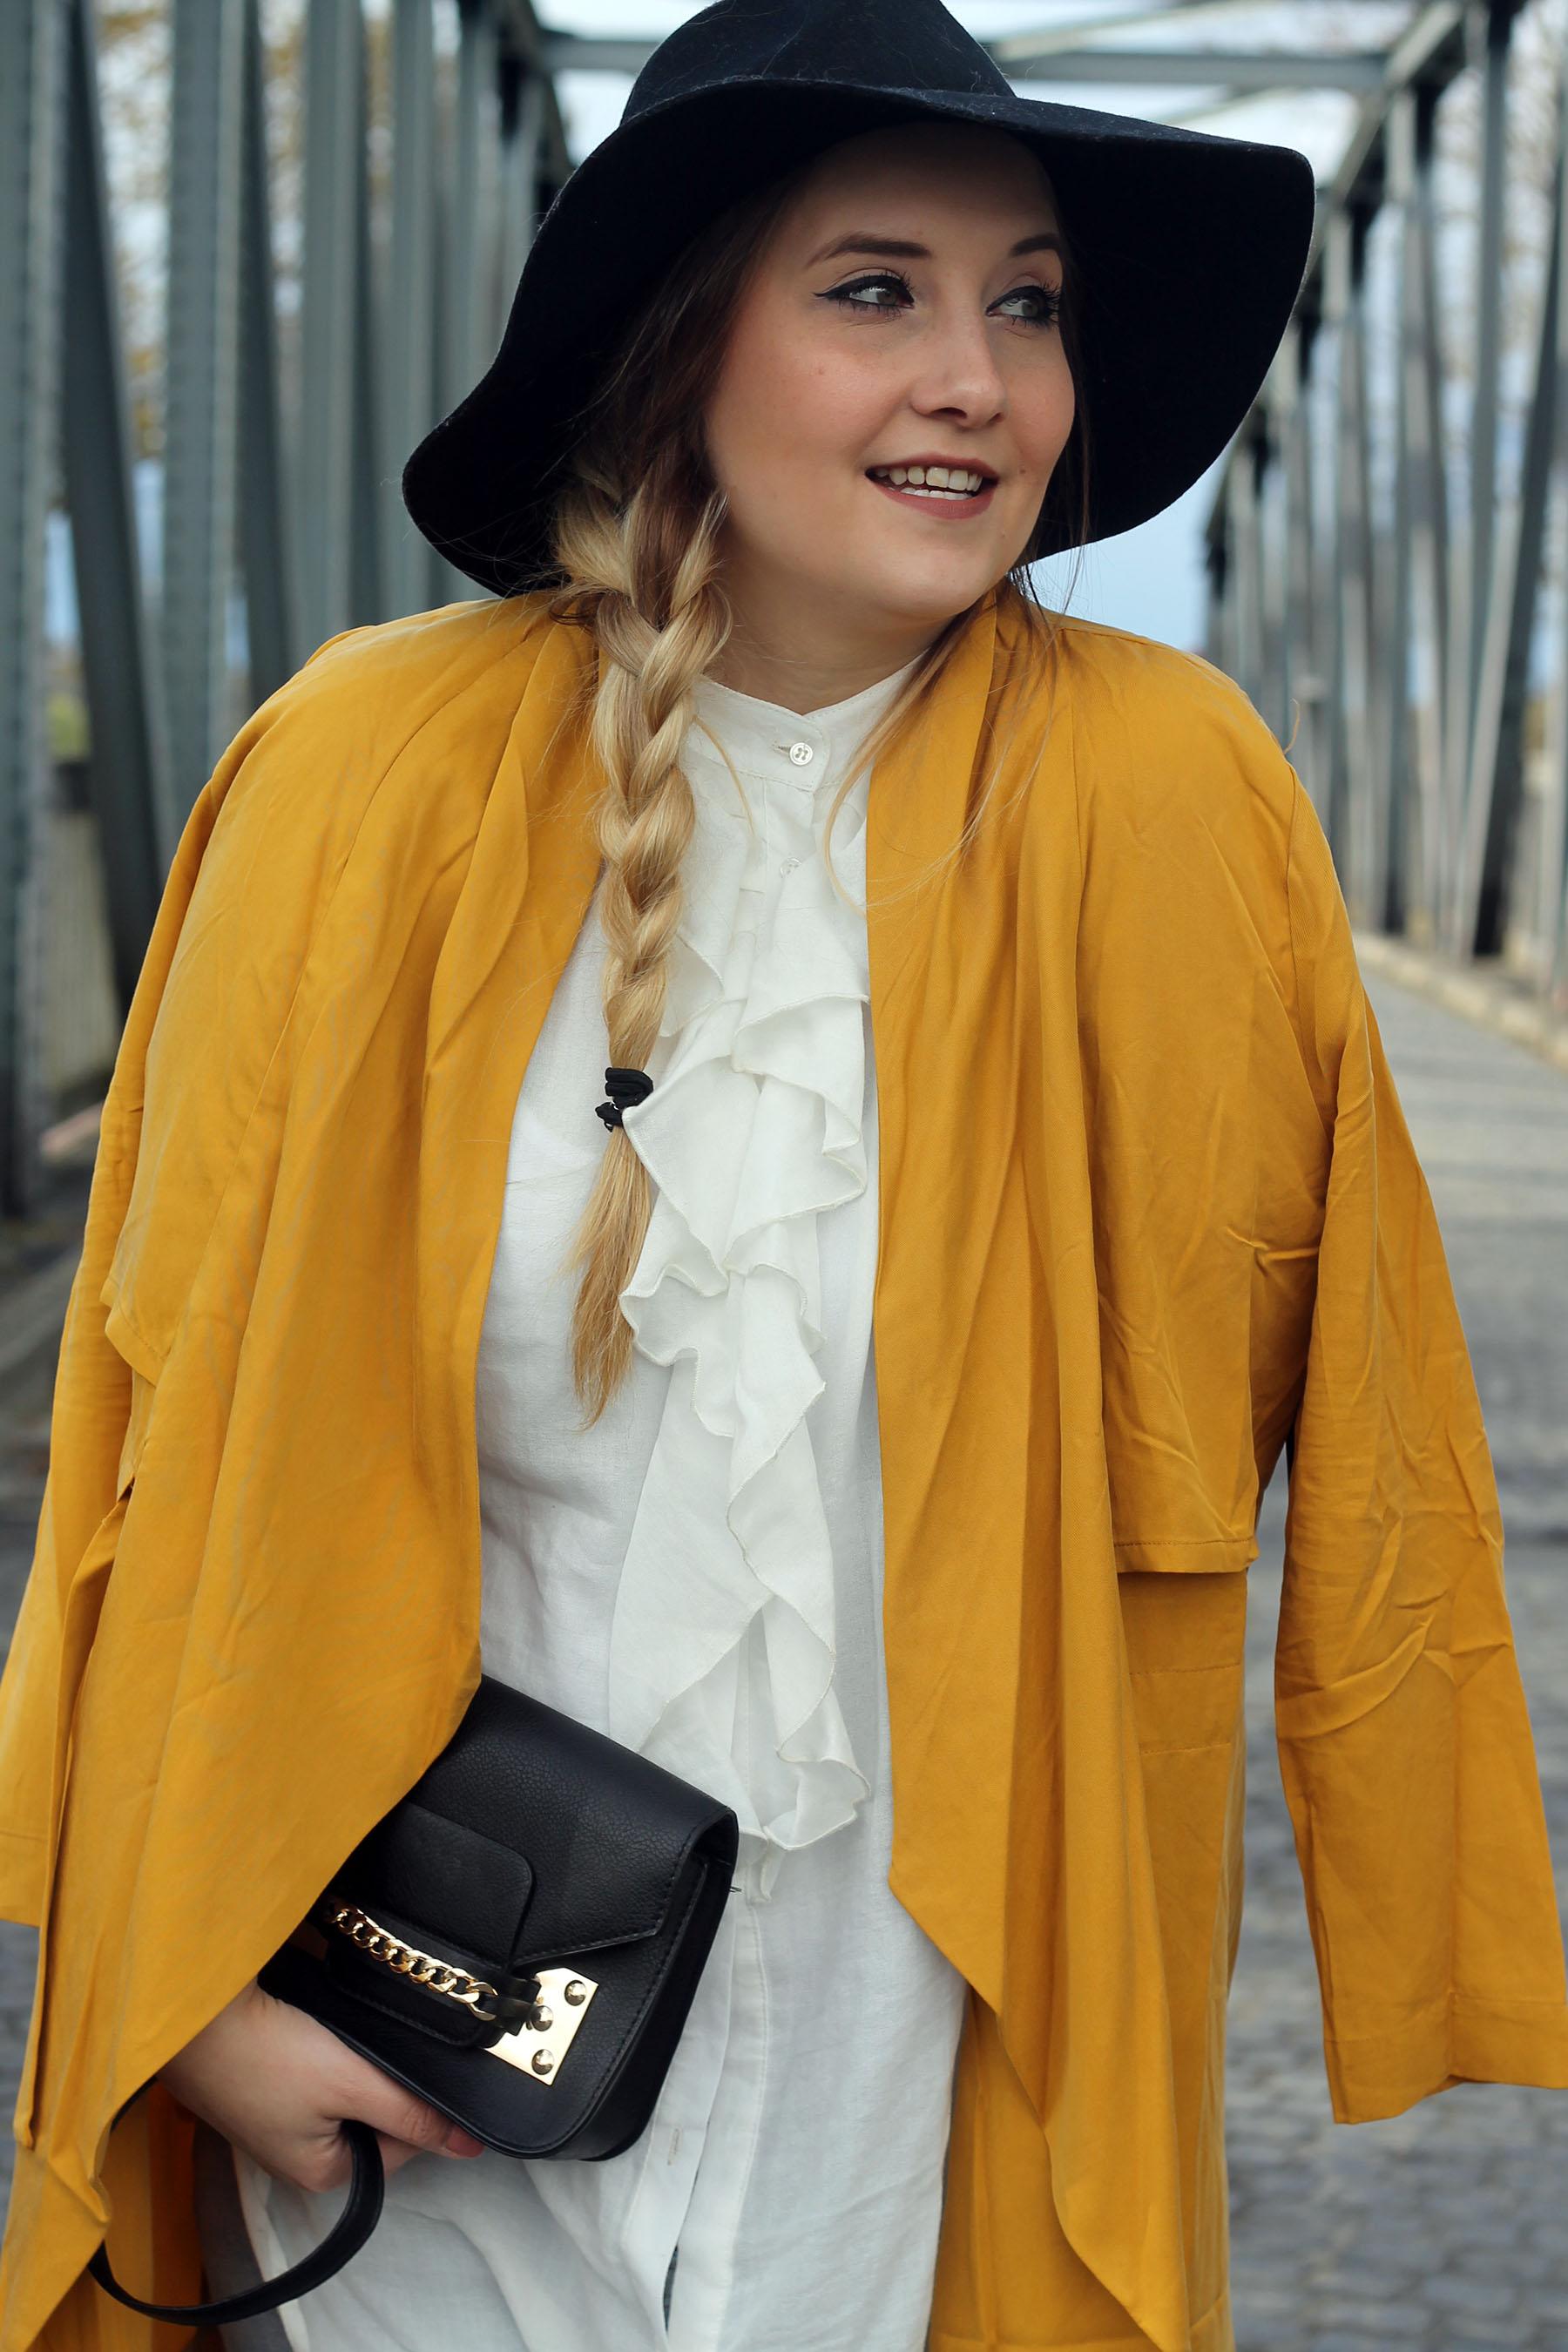 outfit-gelber-mantel-trendfarbe-modeblof-fashionblog-berlin